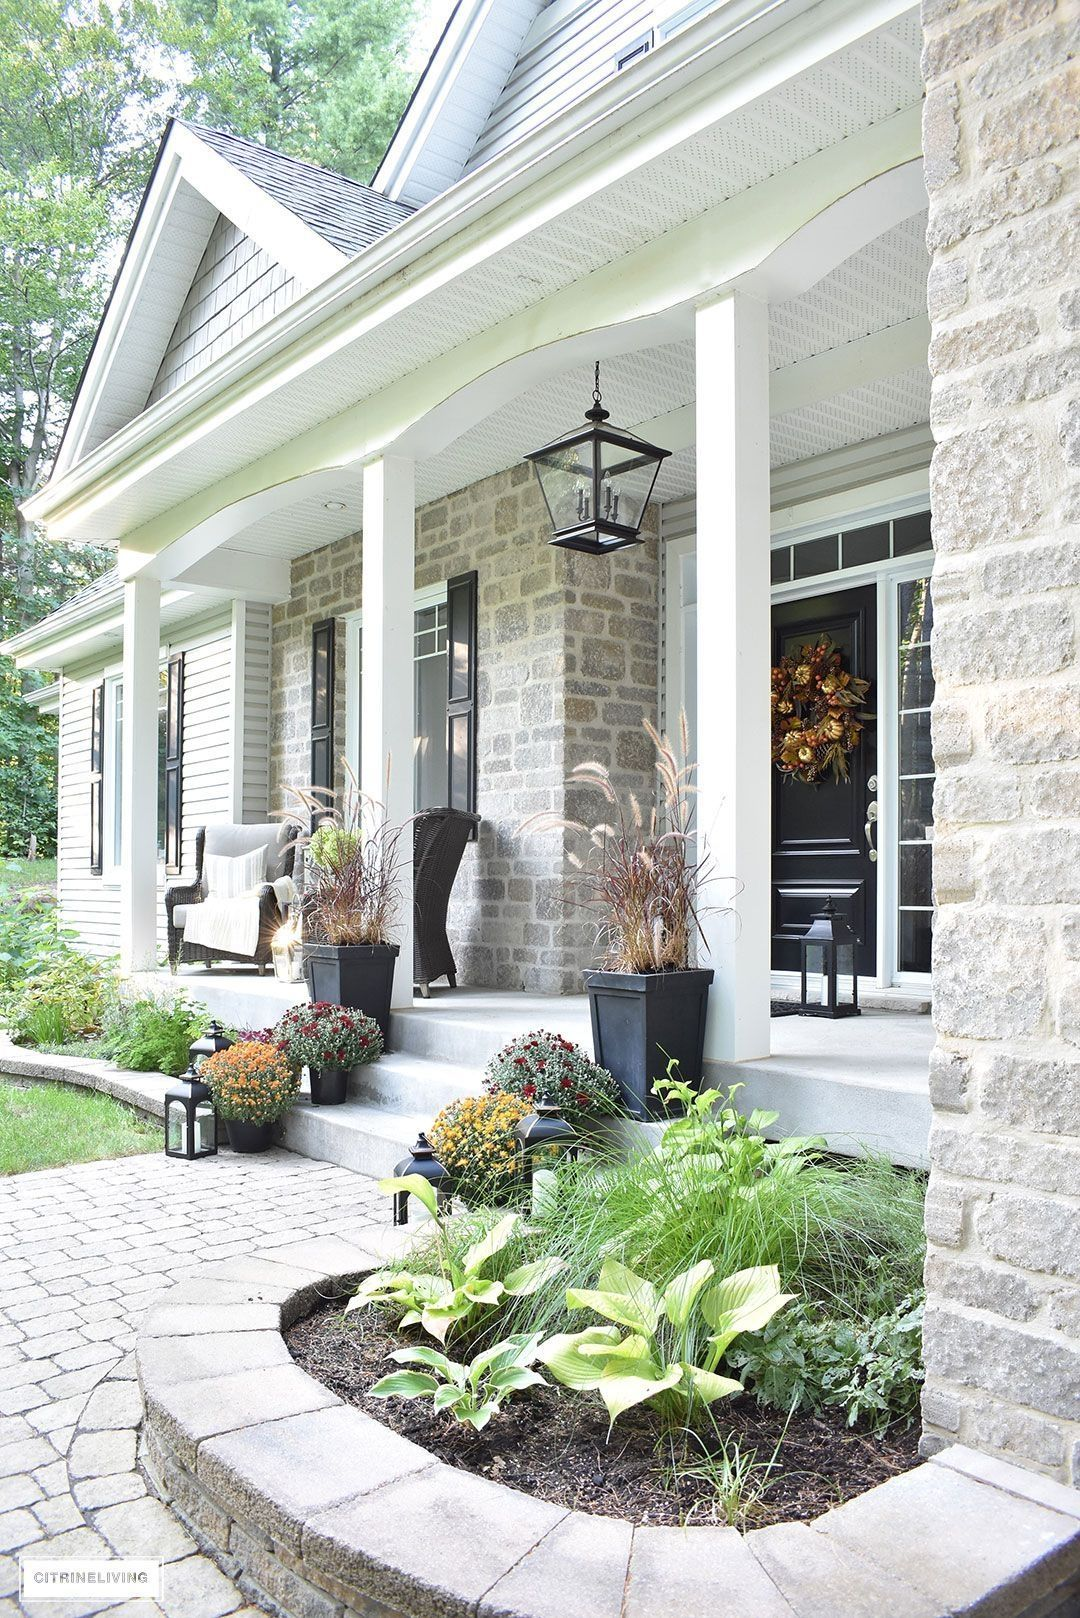 39 amazing zen garden ideas for frontyard and backyard on classy backyard design ideas may be you never think id=82538